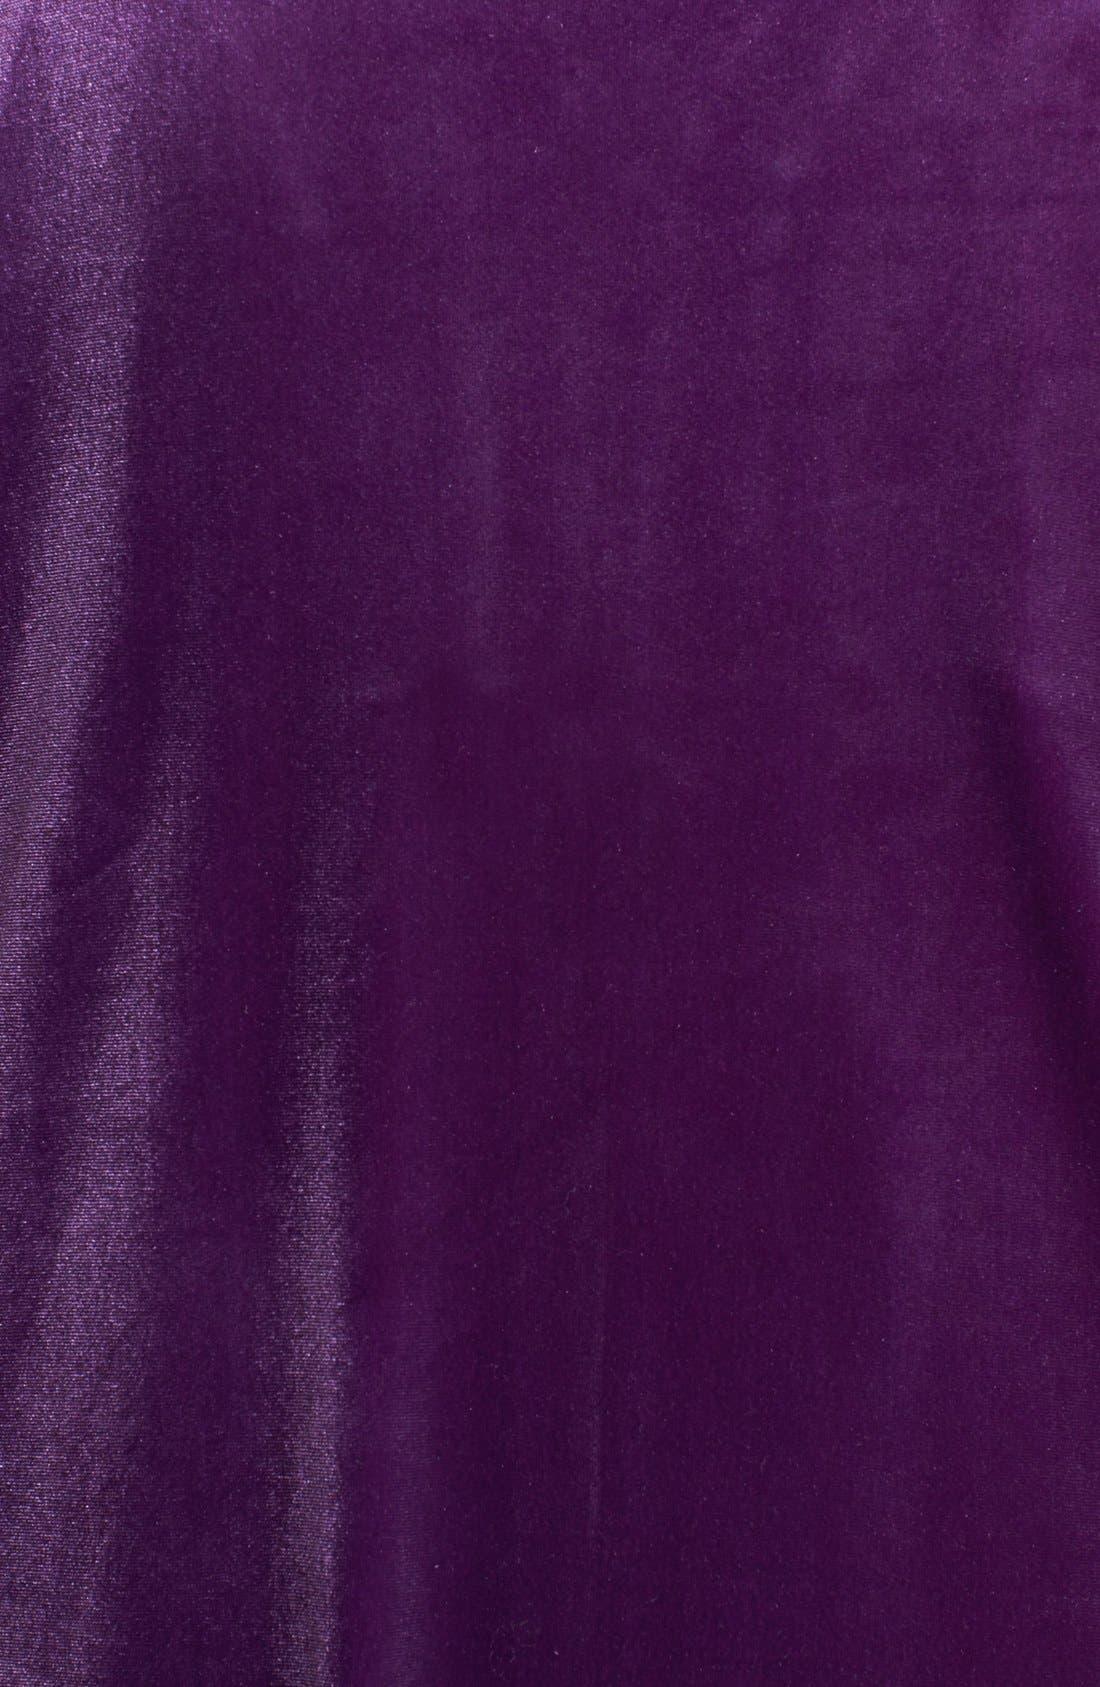 Sleepwear 'Zahara Nights' Robe,                             Alternate thumbnail 7, color,